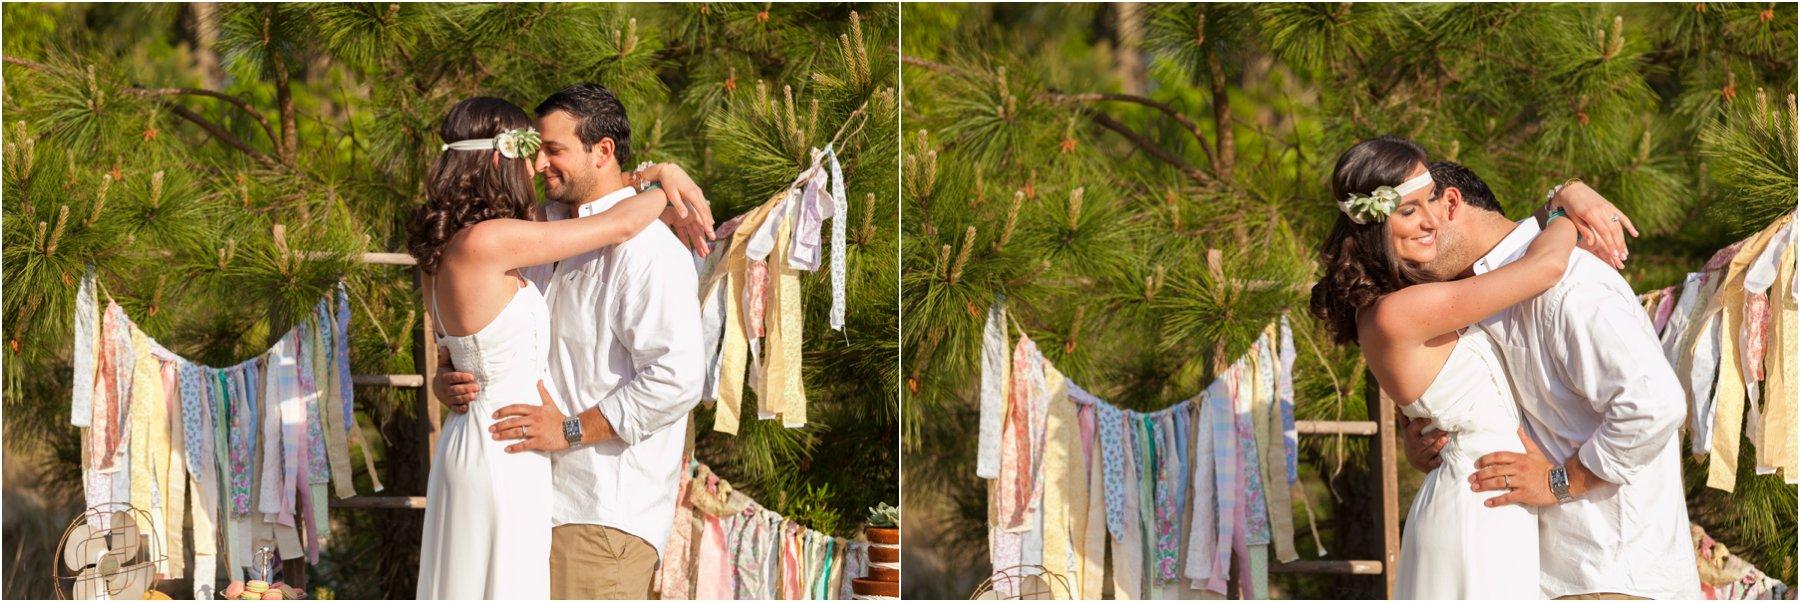 first_landing_wedding_boho_wedding_photography_virginia_Jessica_ryan_photography_0193